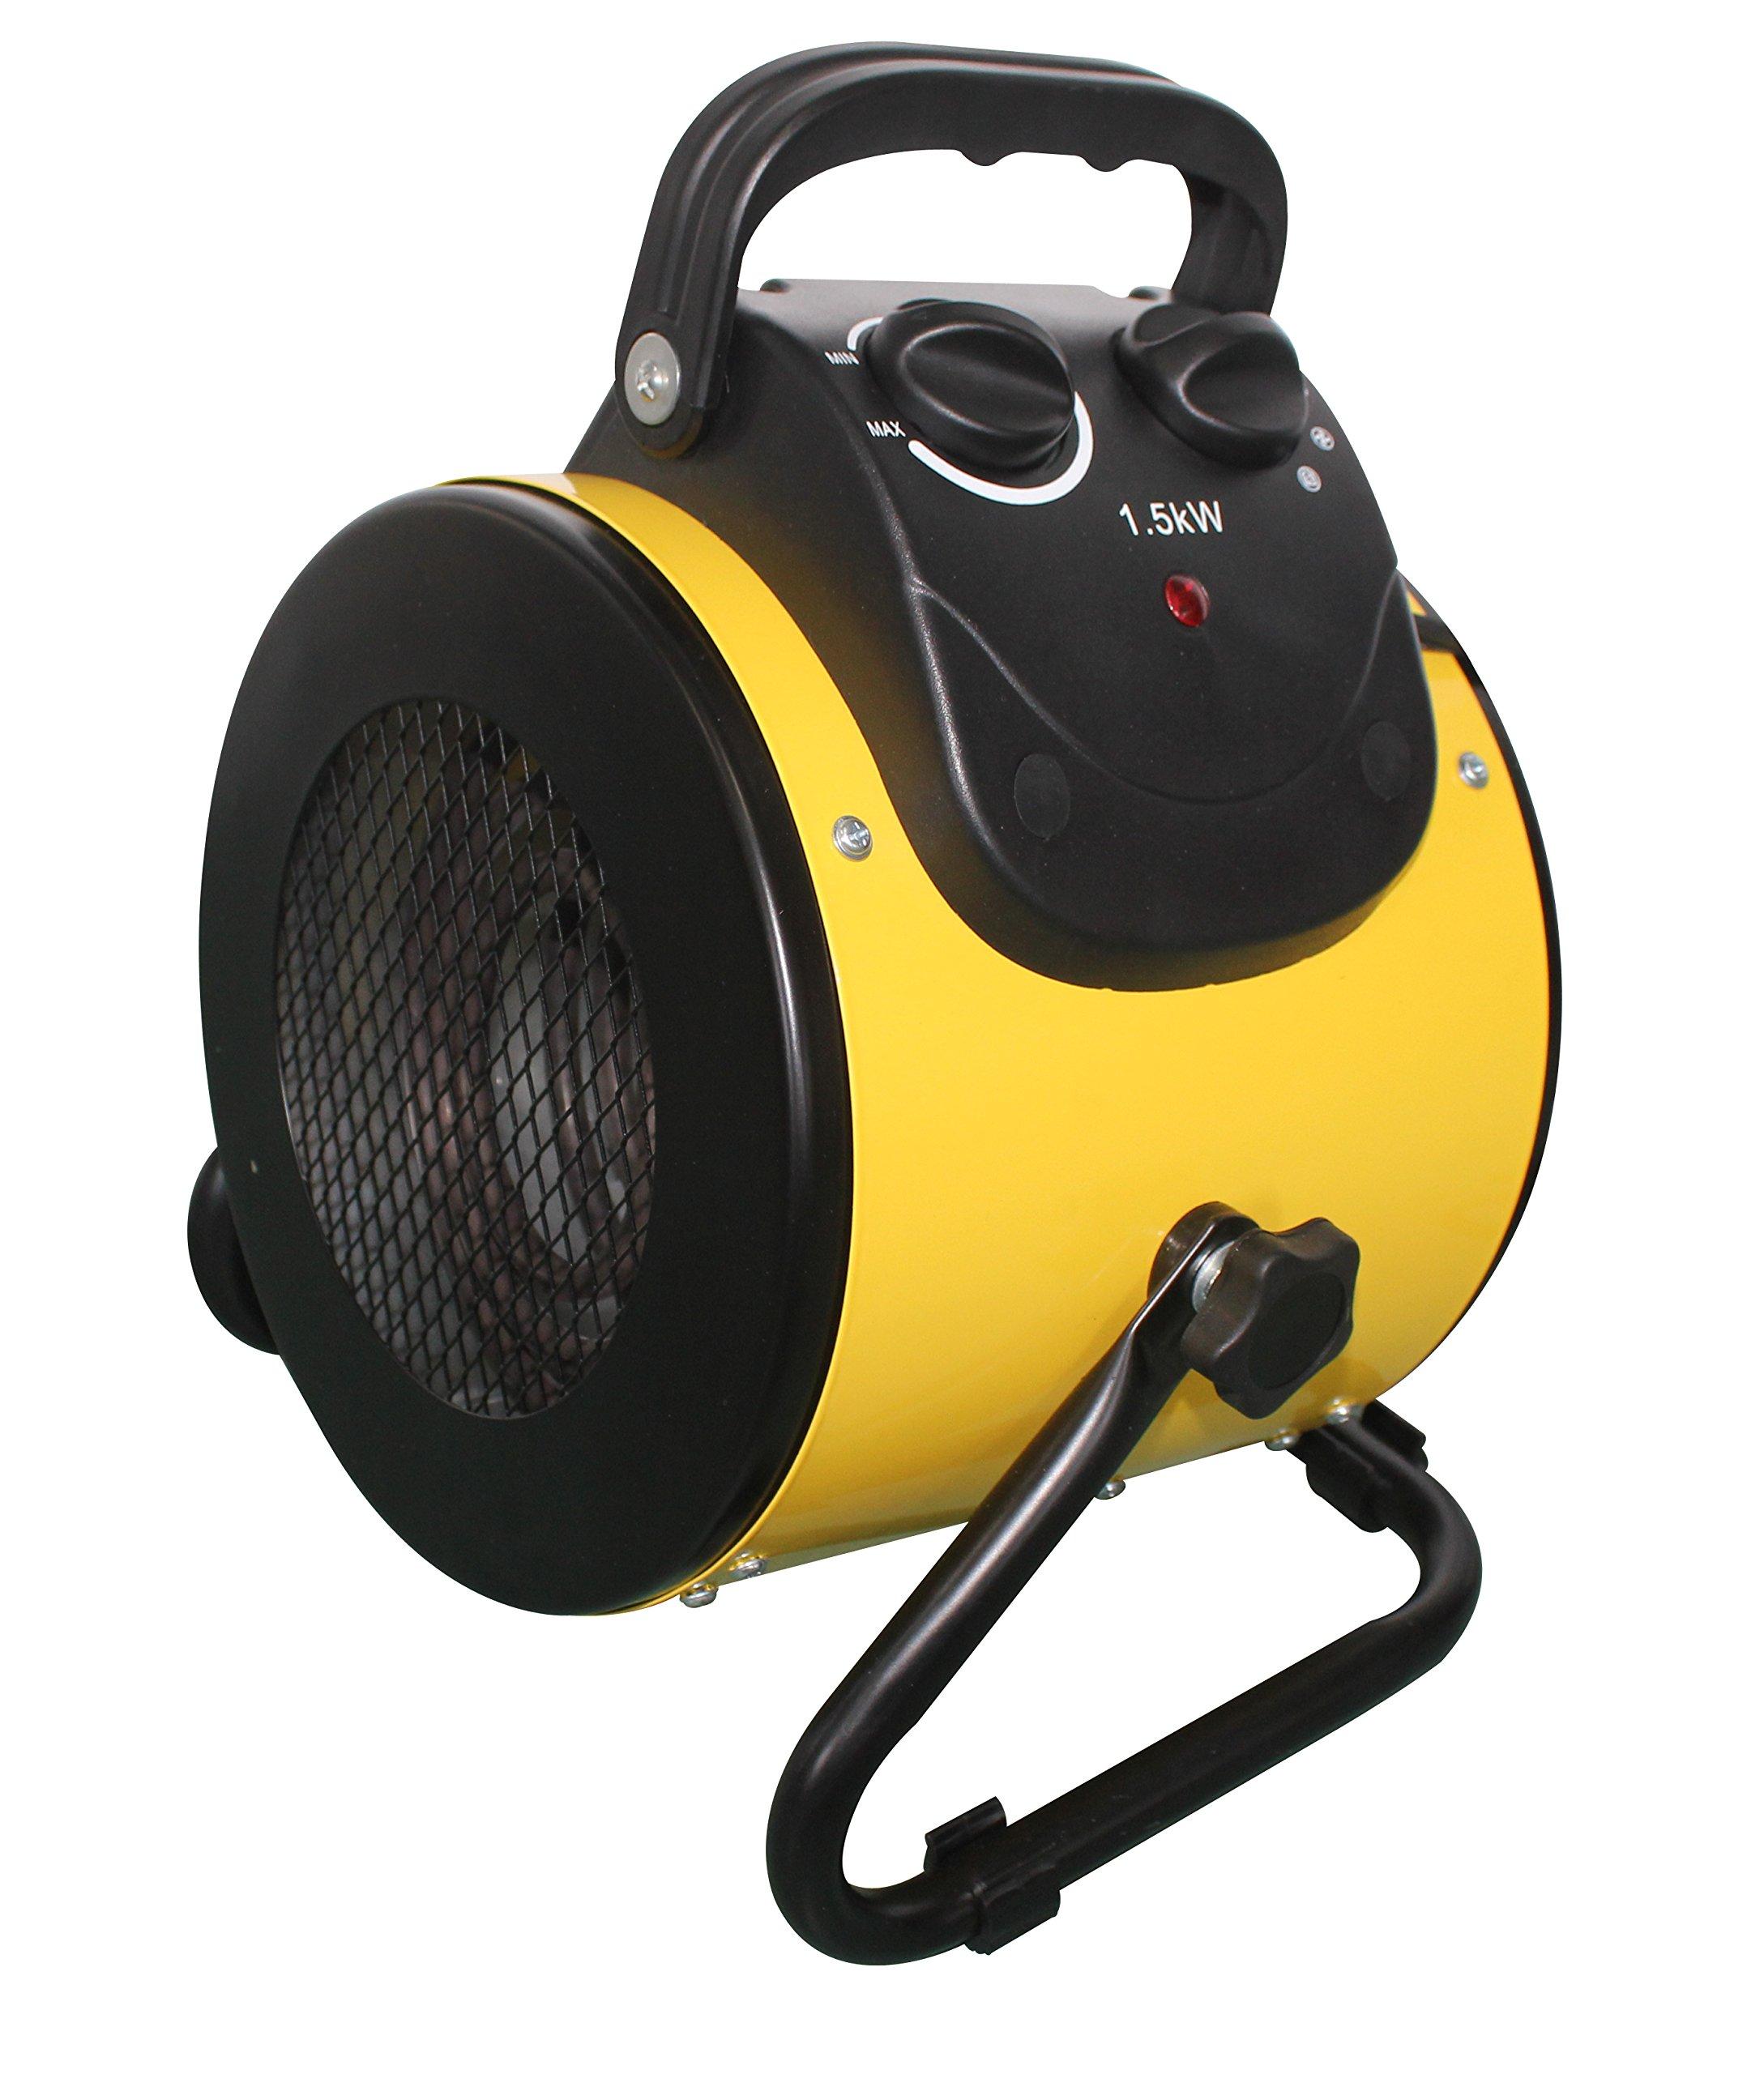 AZ Patio HIL-BG-E2B Circular Electric Fan Heater